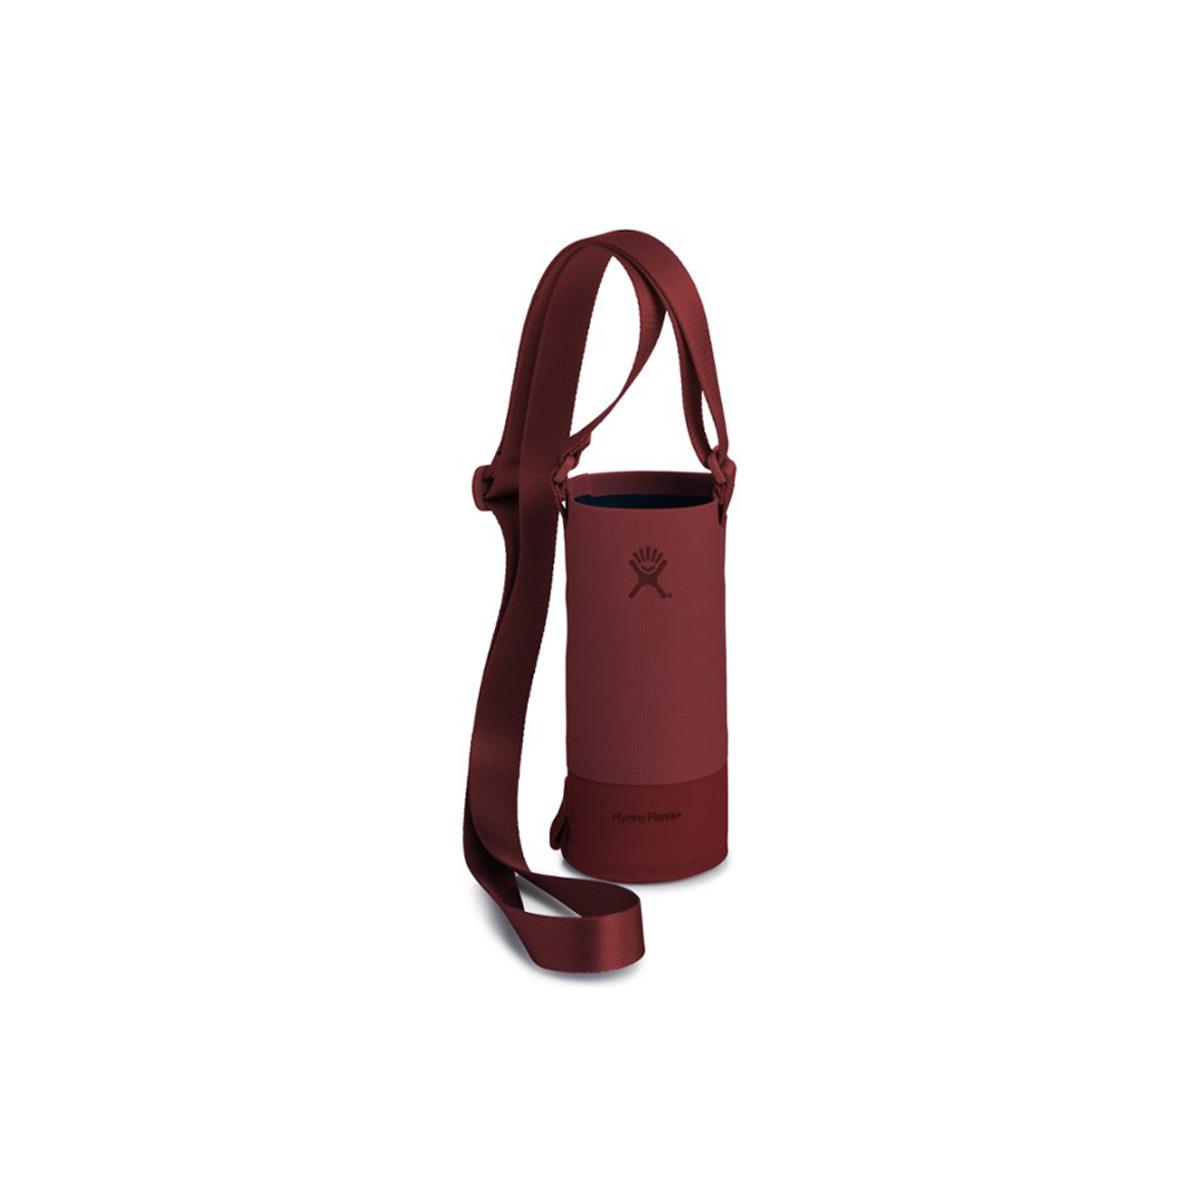 Hydro Flask Bottle Sling - Large